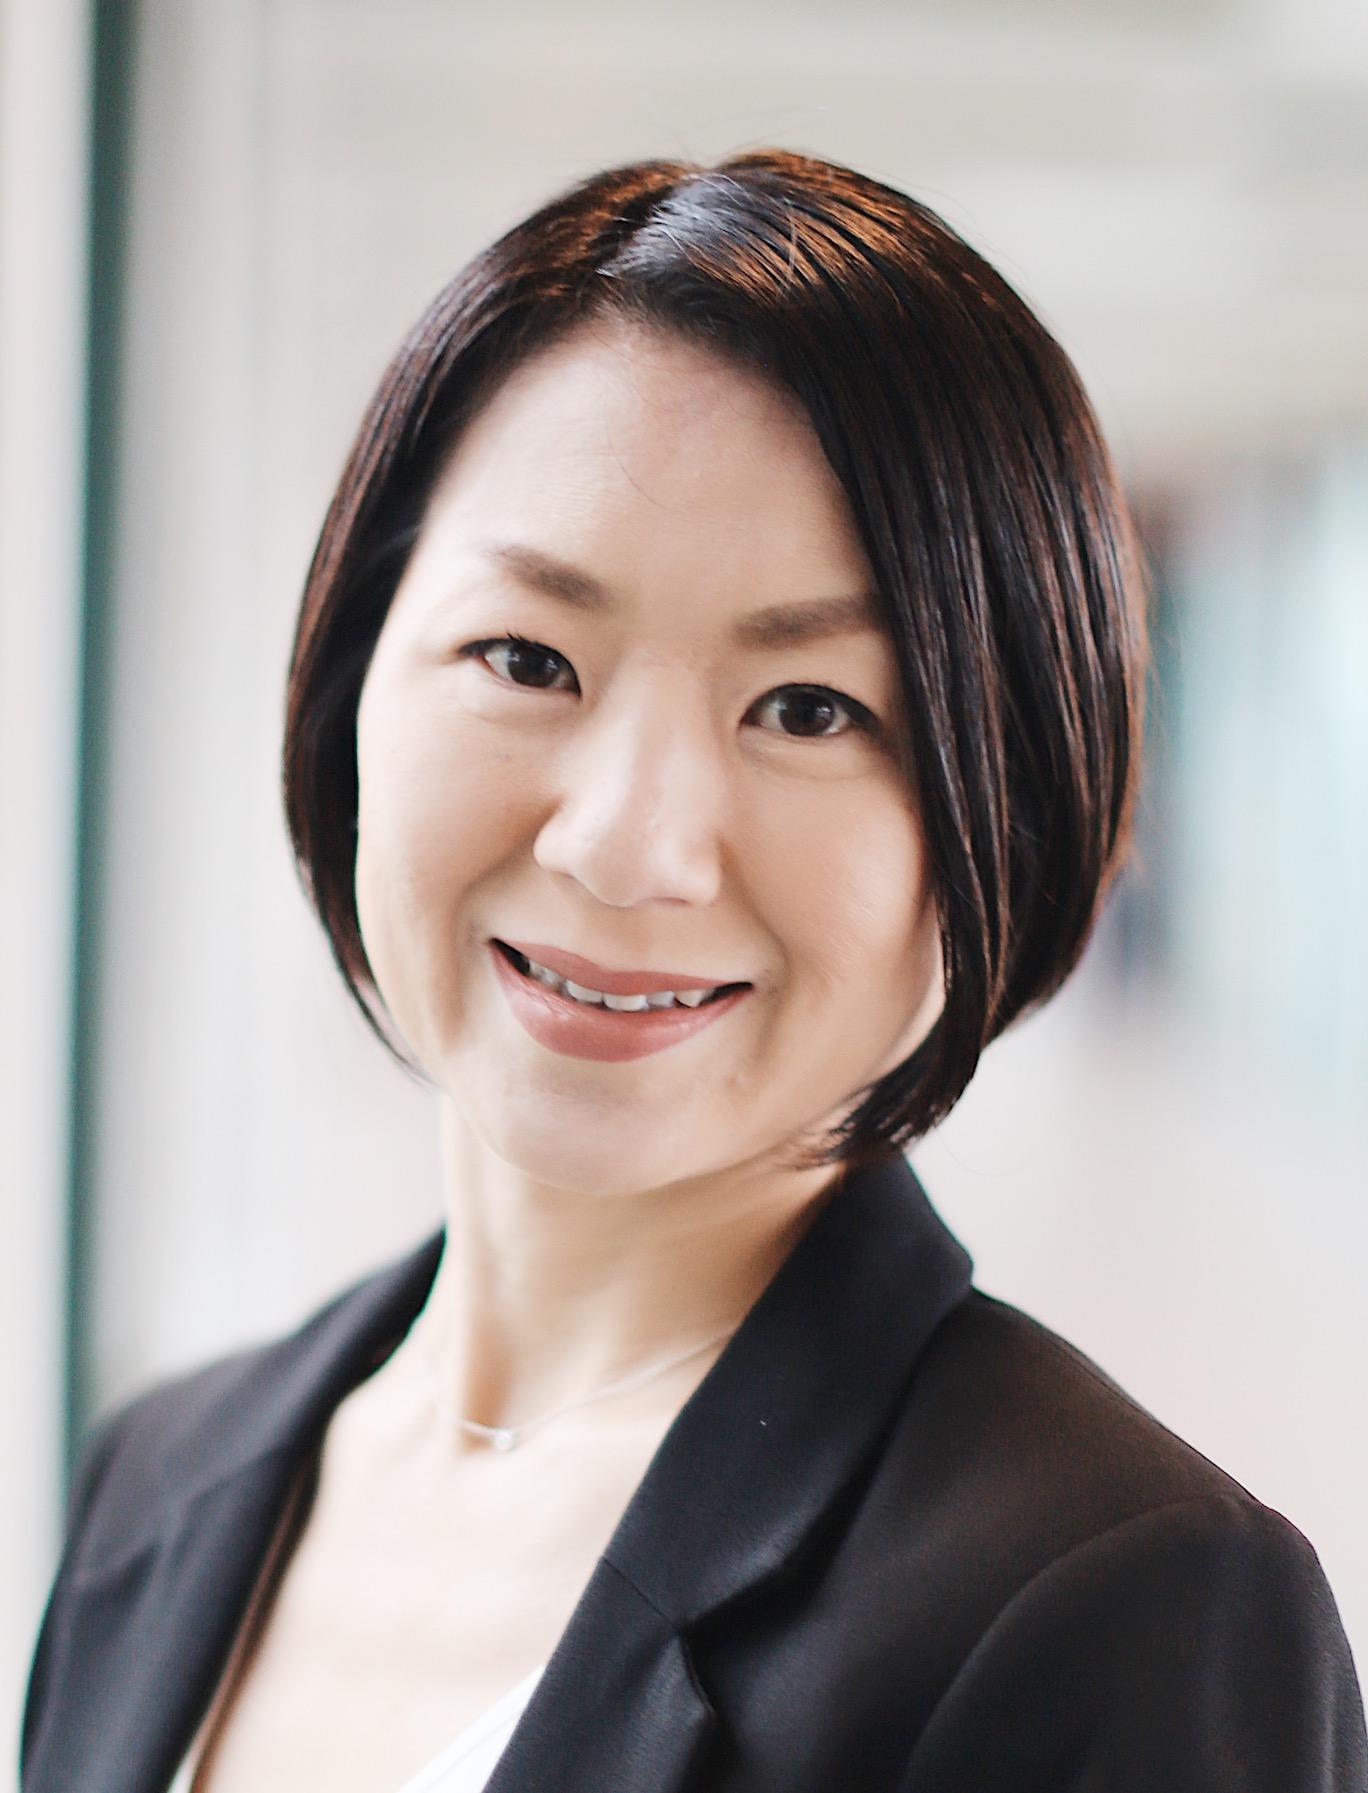 Etsuko Uemura